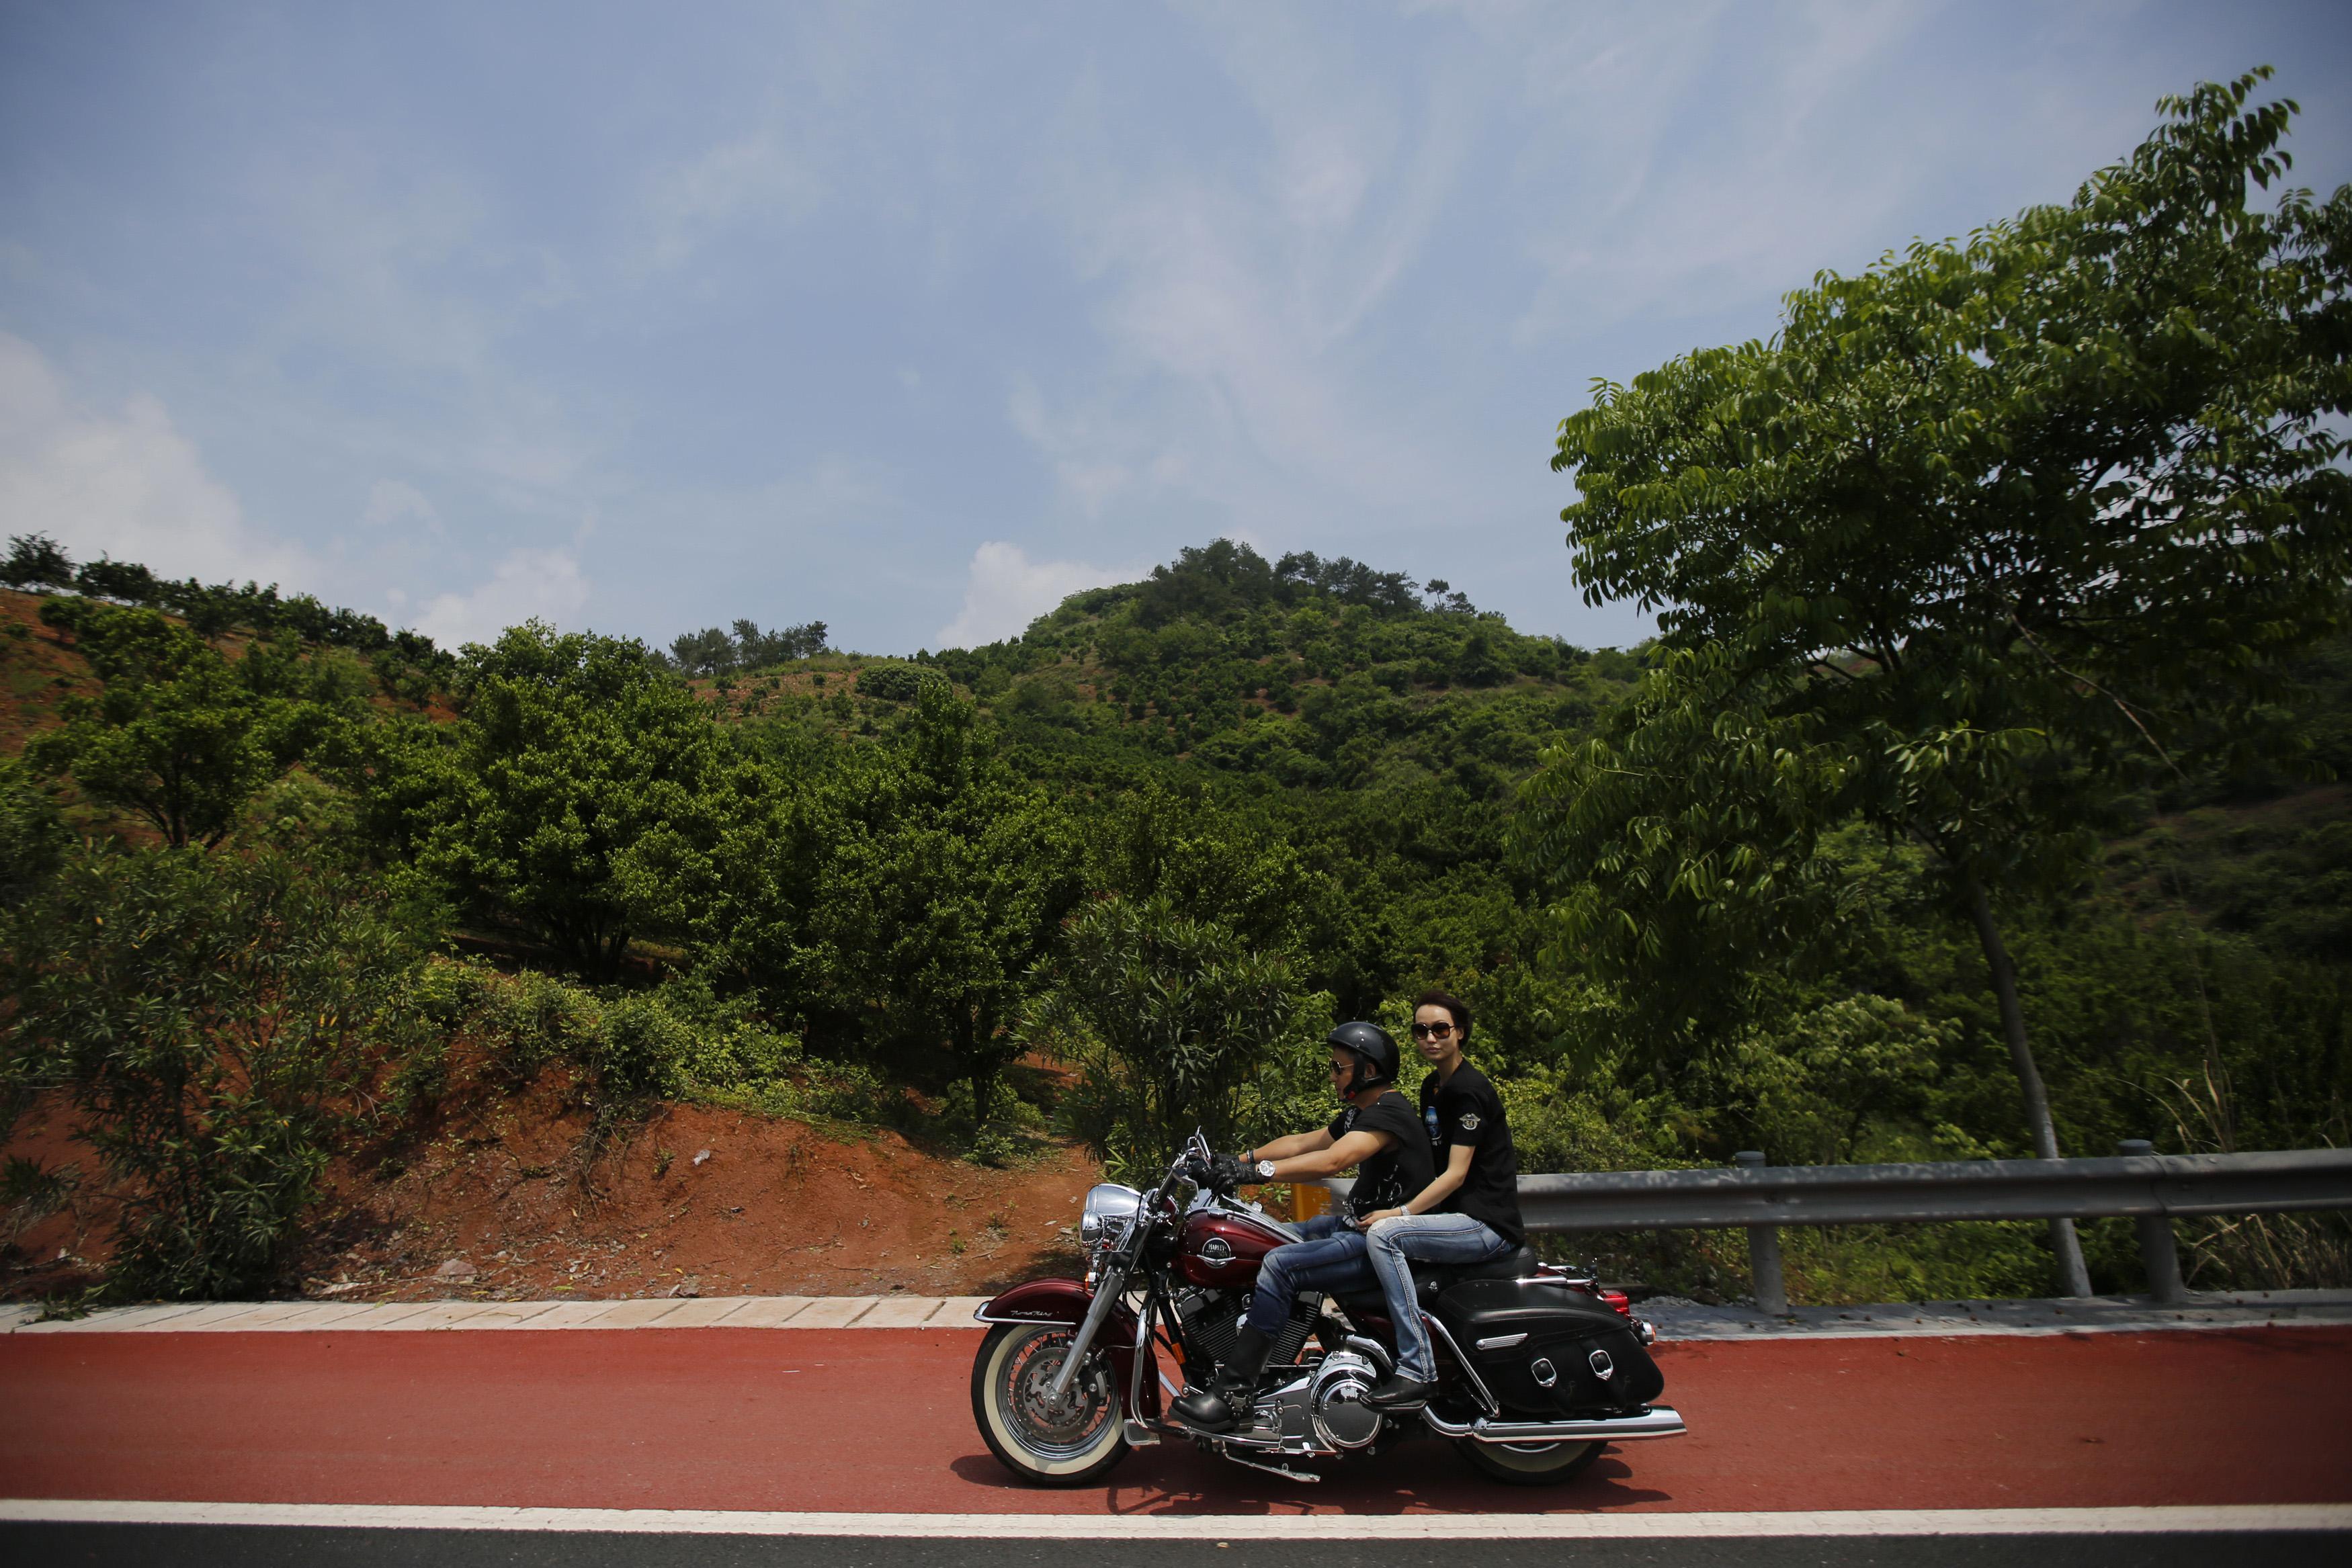 Harley-Davidson strikes deal to make smaller bikes in China